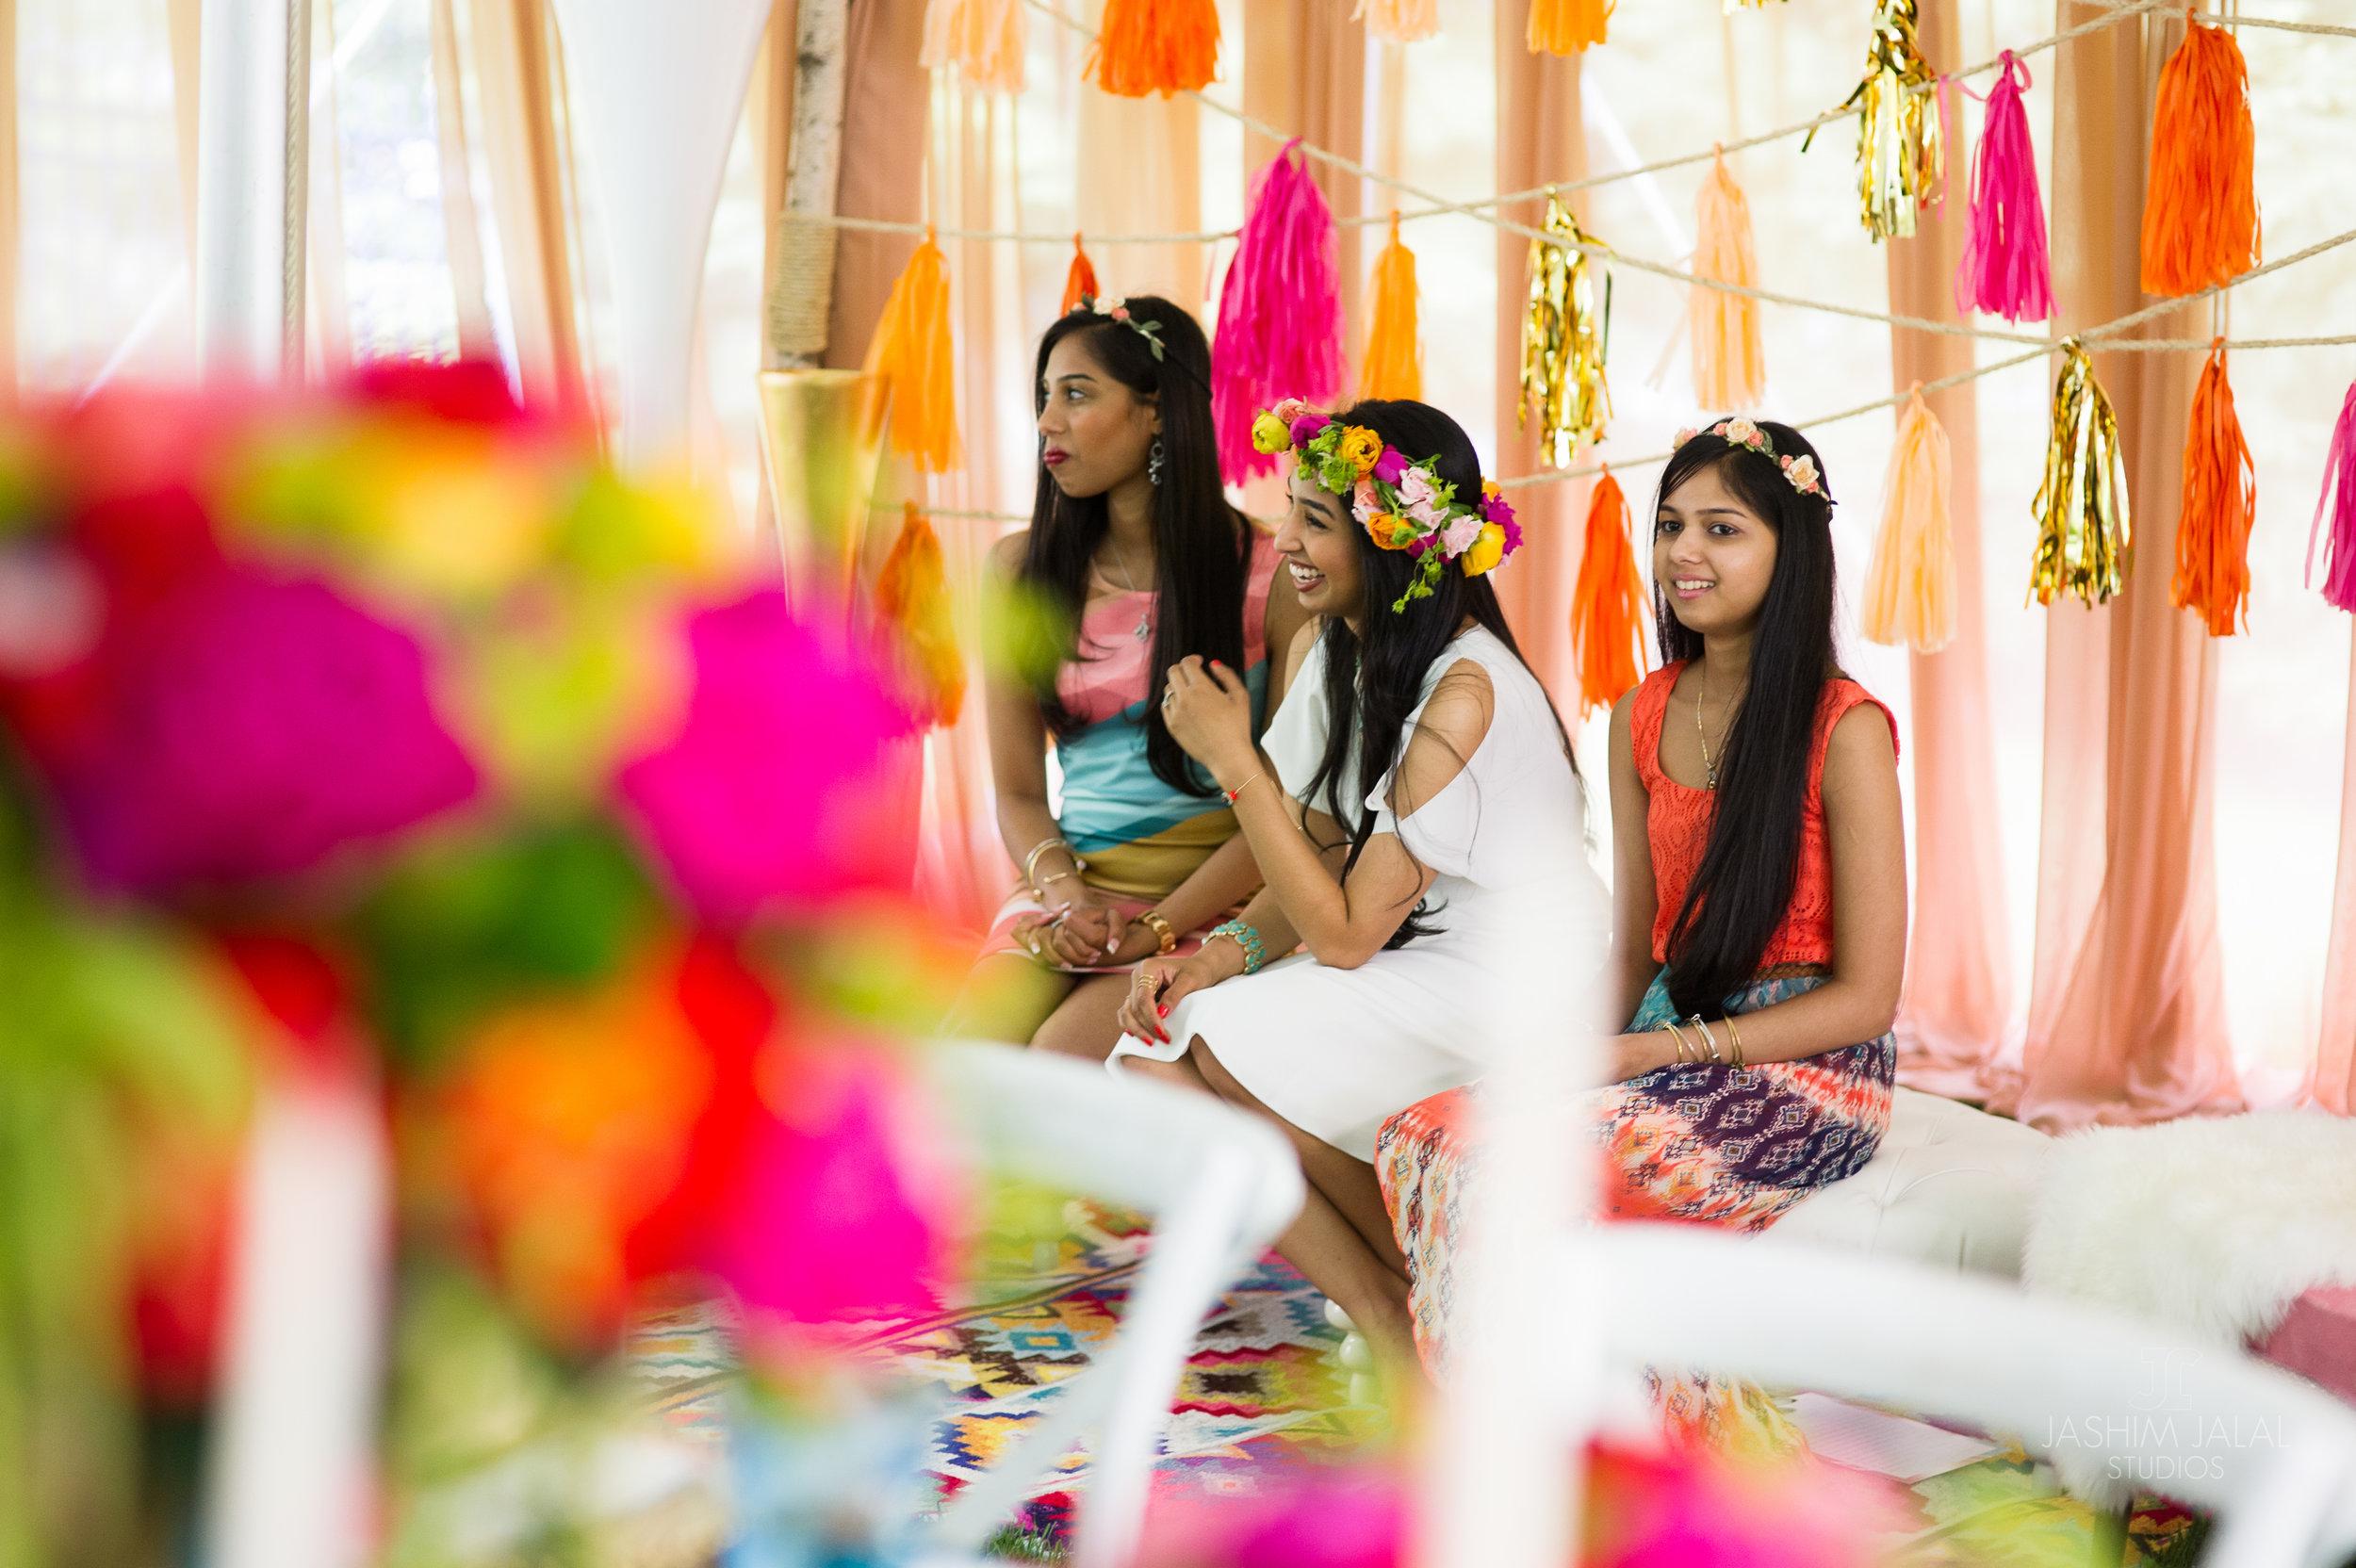 Indian Bridal Shower Boho Chic Summer Tent Event with Dancer (3).JPG